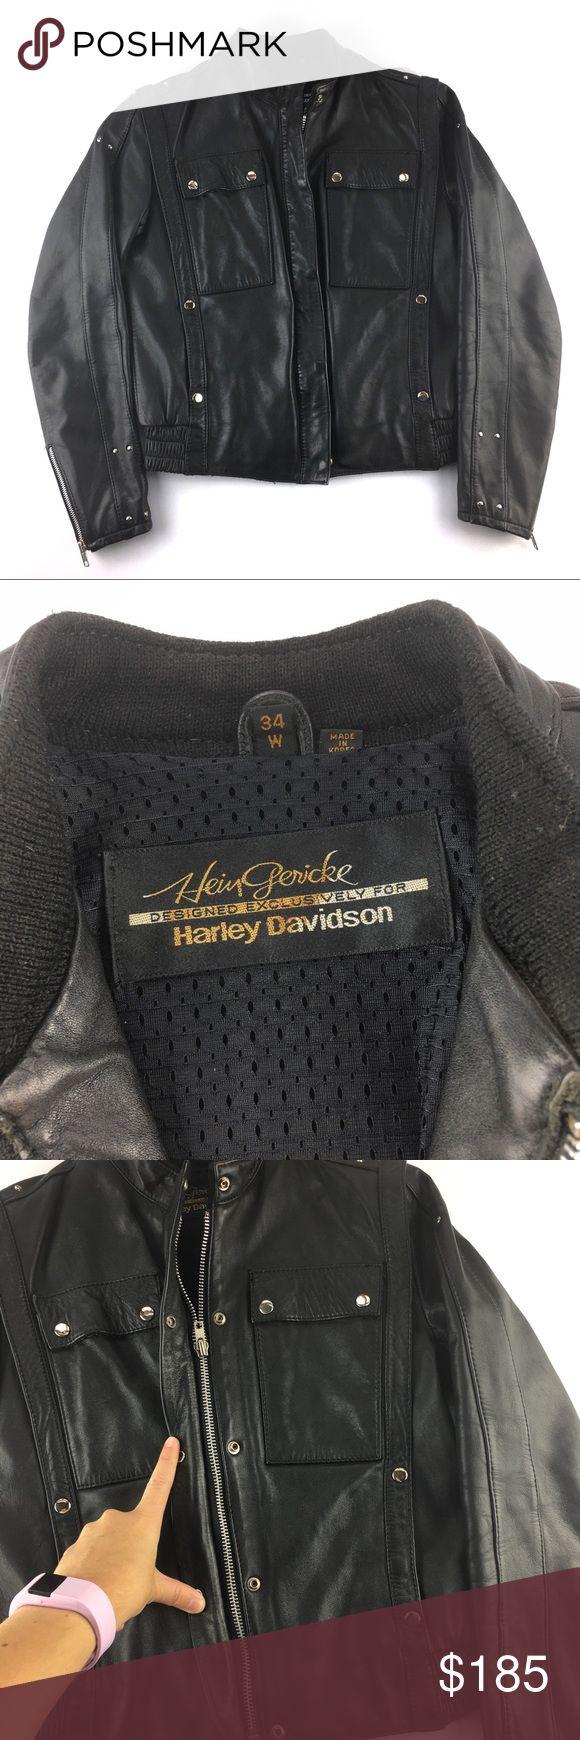 Harley Davidson Hein Gericke Motorcycle Jacket Brand